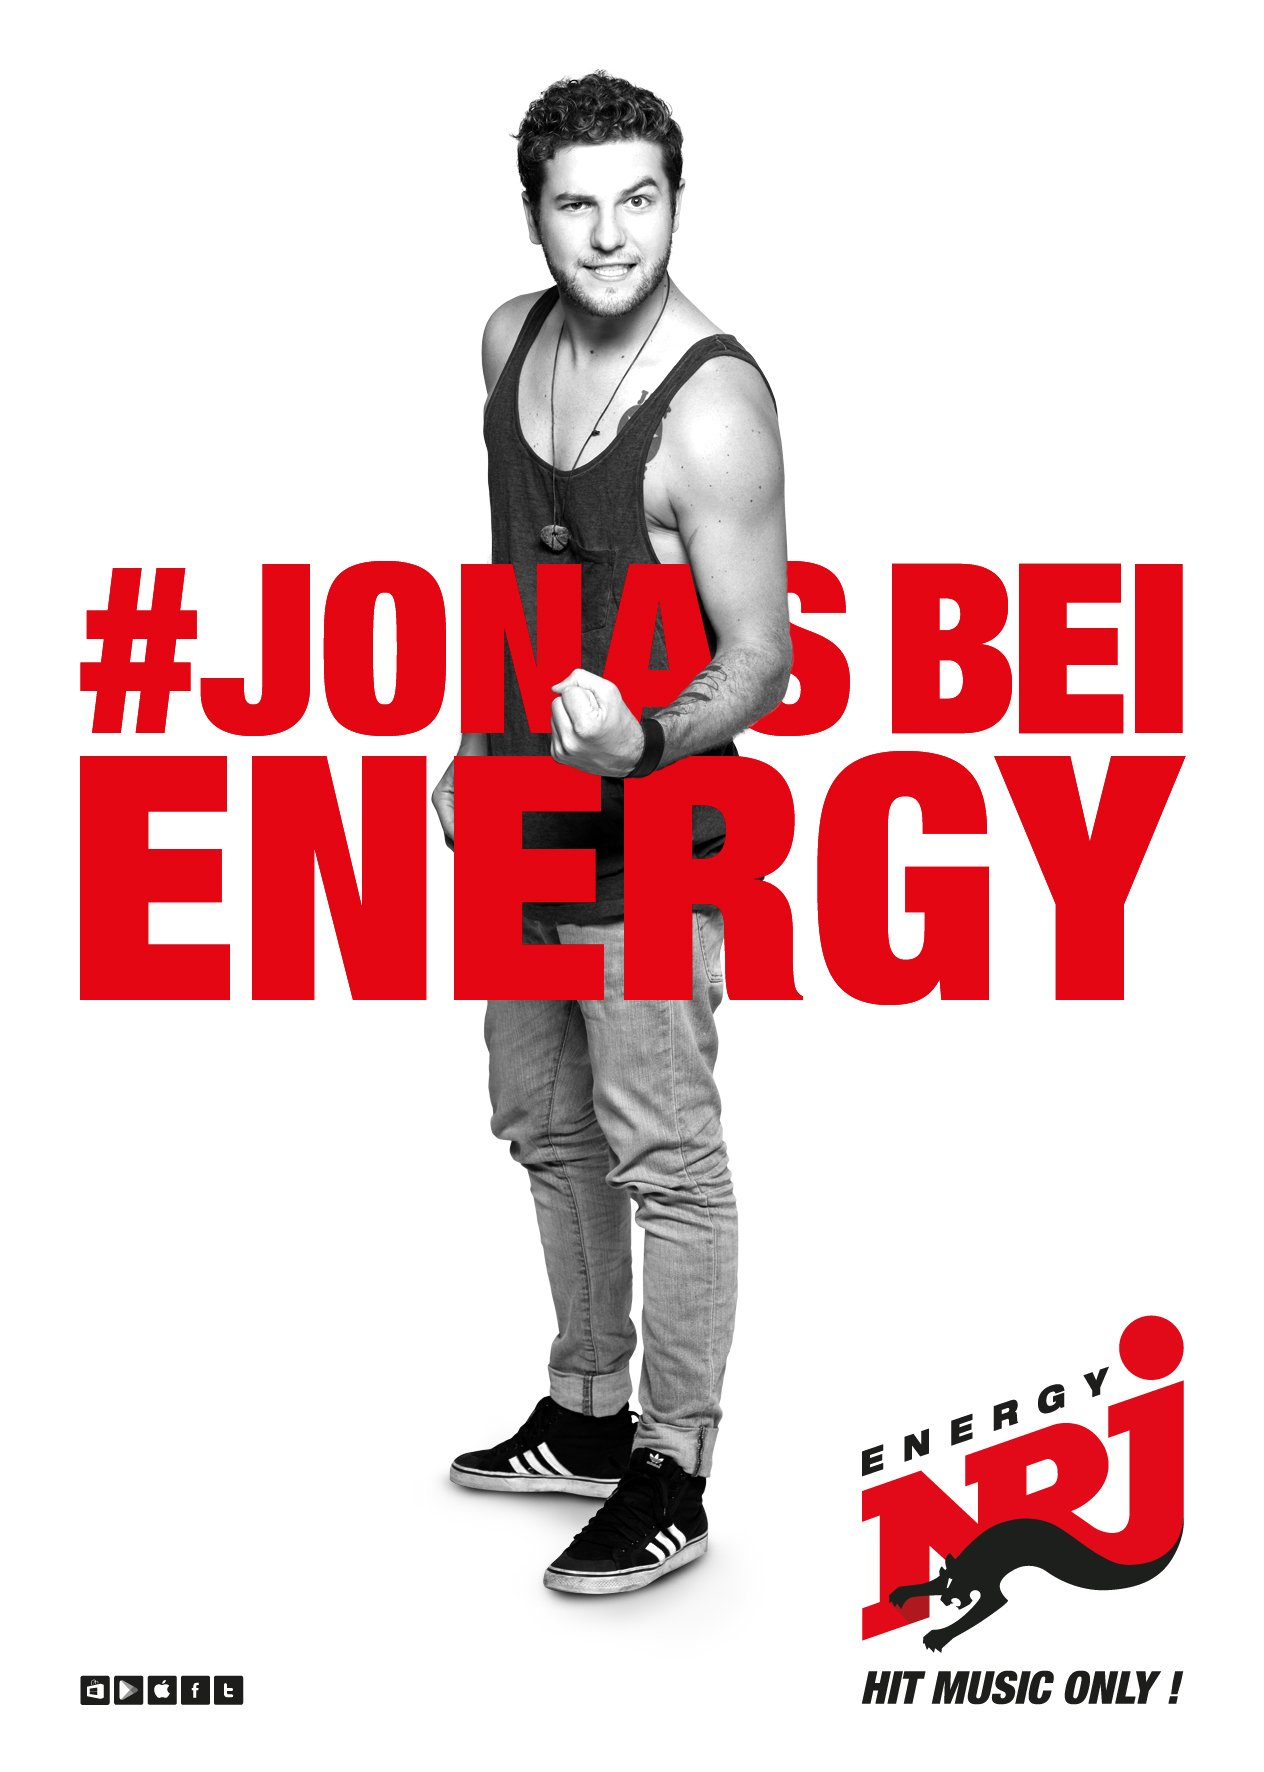 JONAS MANN bei ENERGY